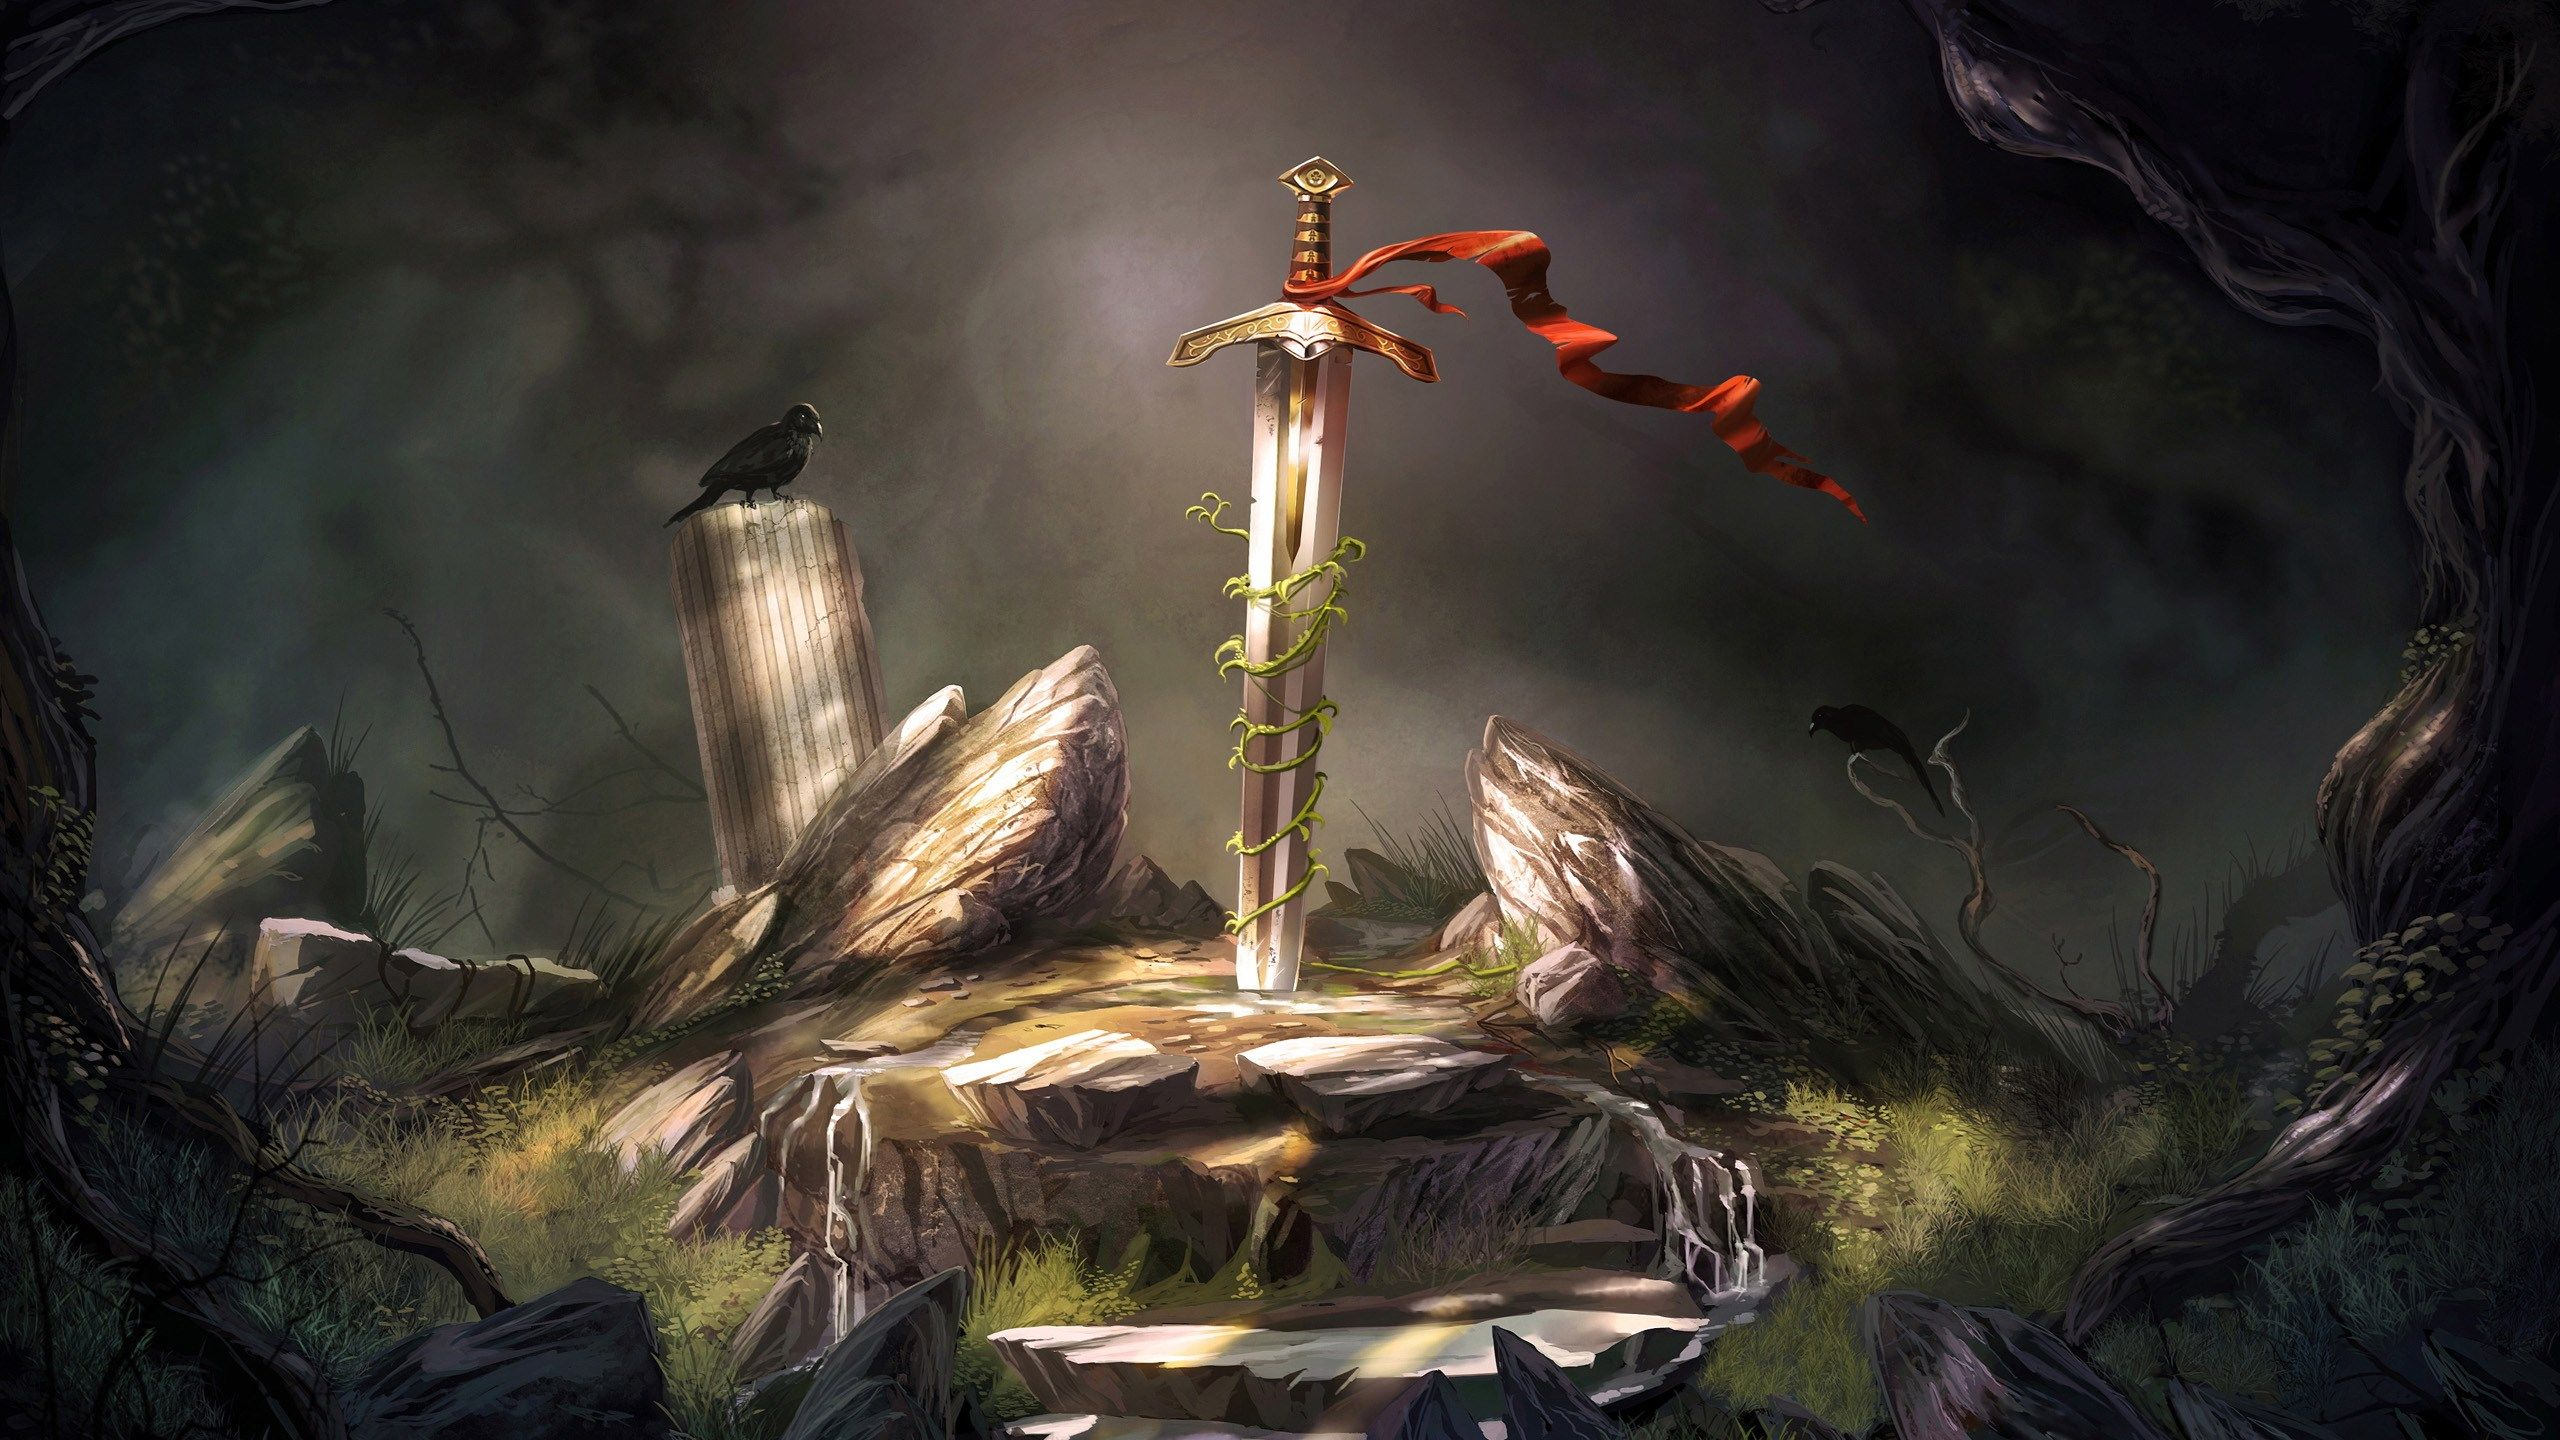 High Quality trine 2 Sword art online wallpaper, Samurai